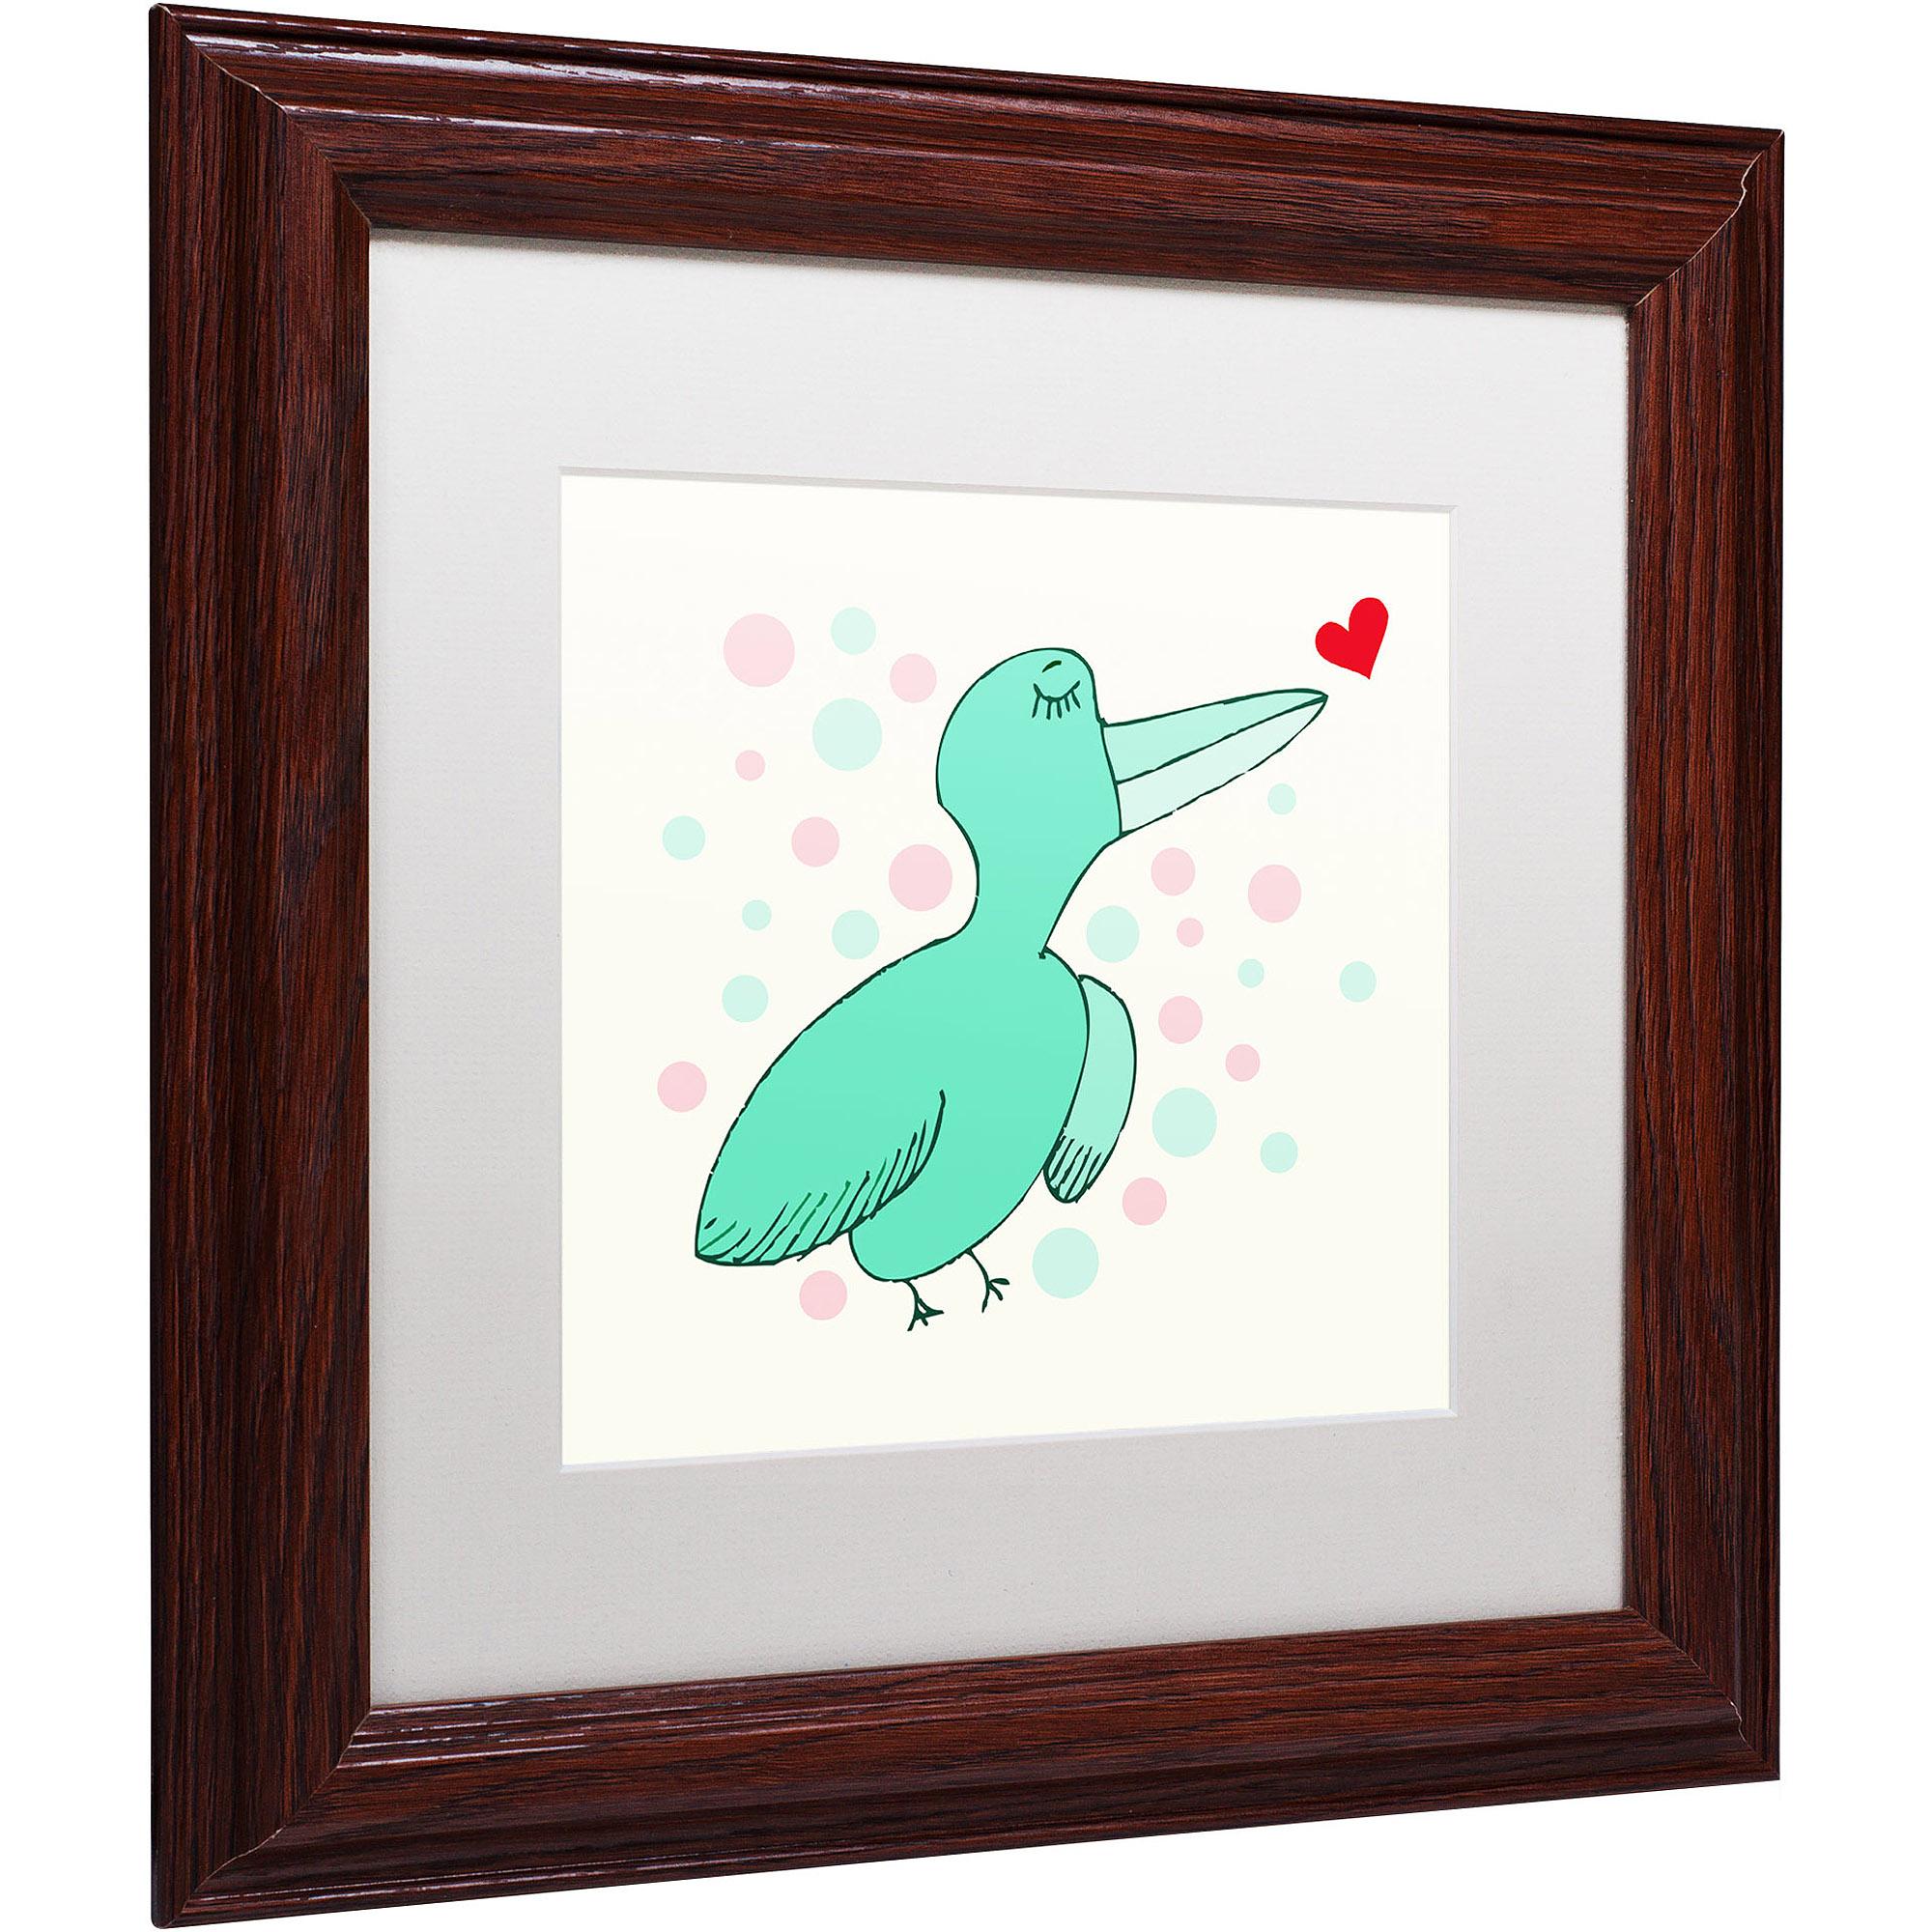 "Trademark Fine Art ""Dreamy Love Bird"" Canvas Art by Carla Martell, White Matte, Wood Frame"